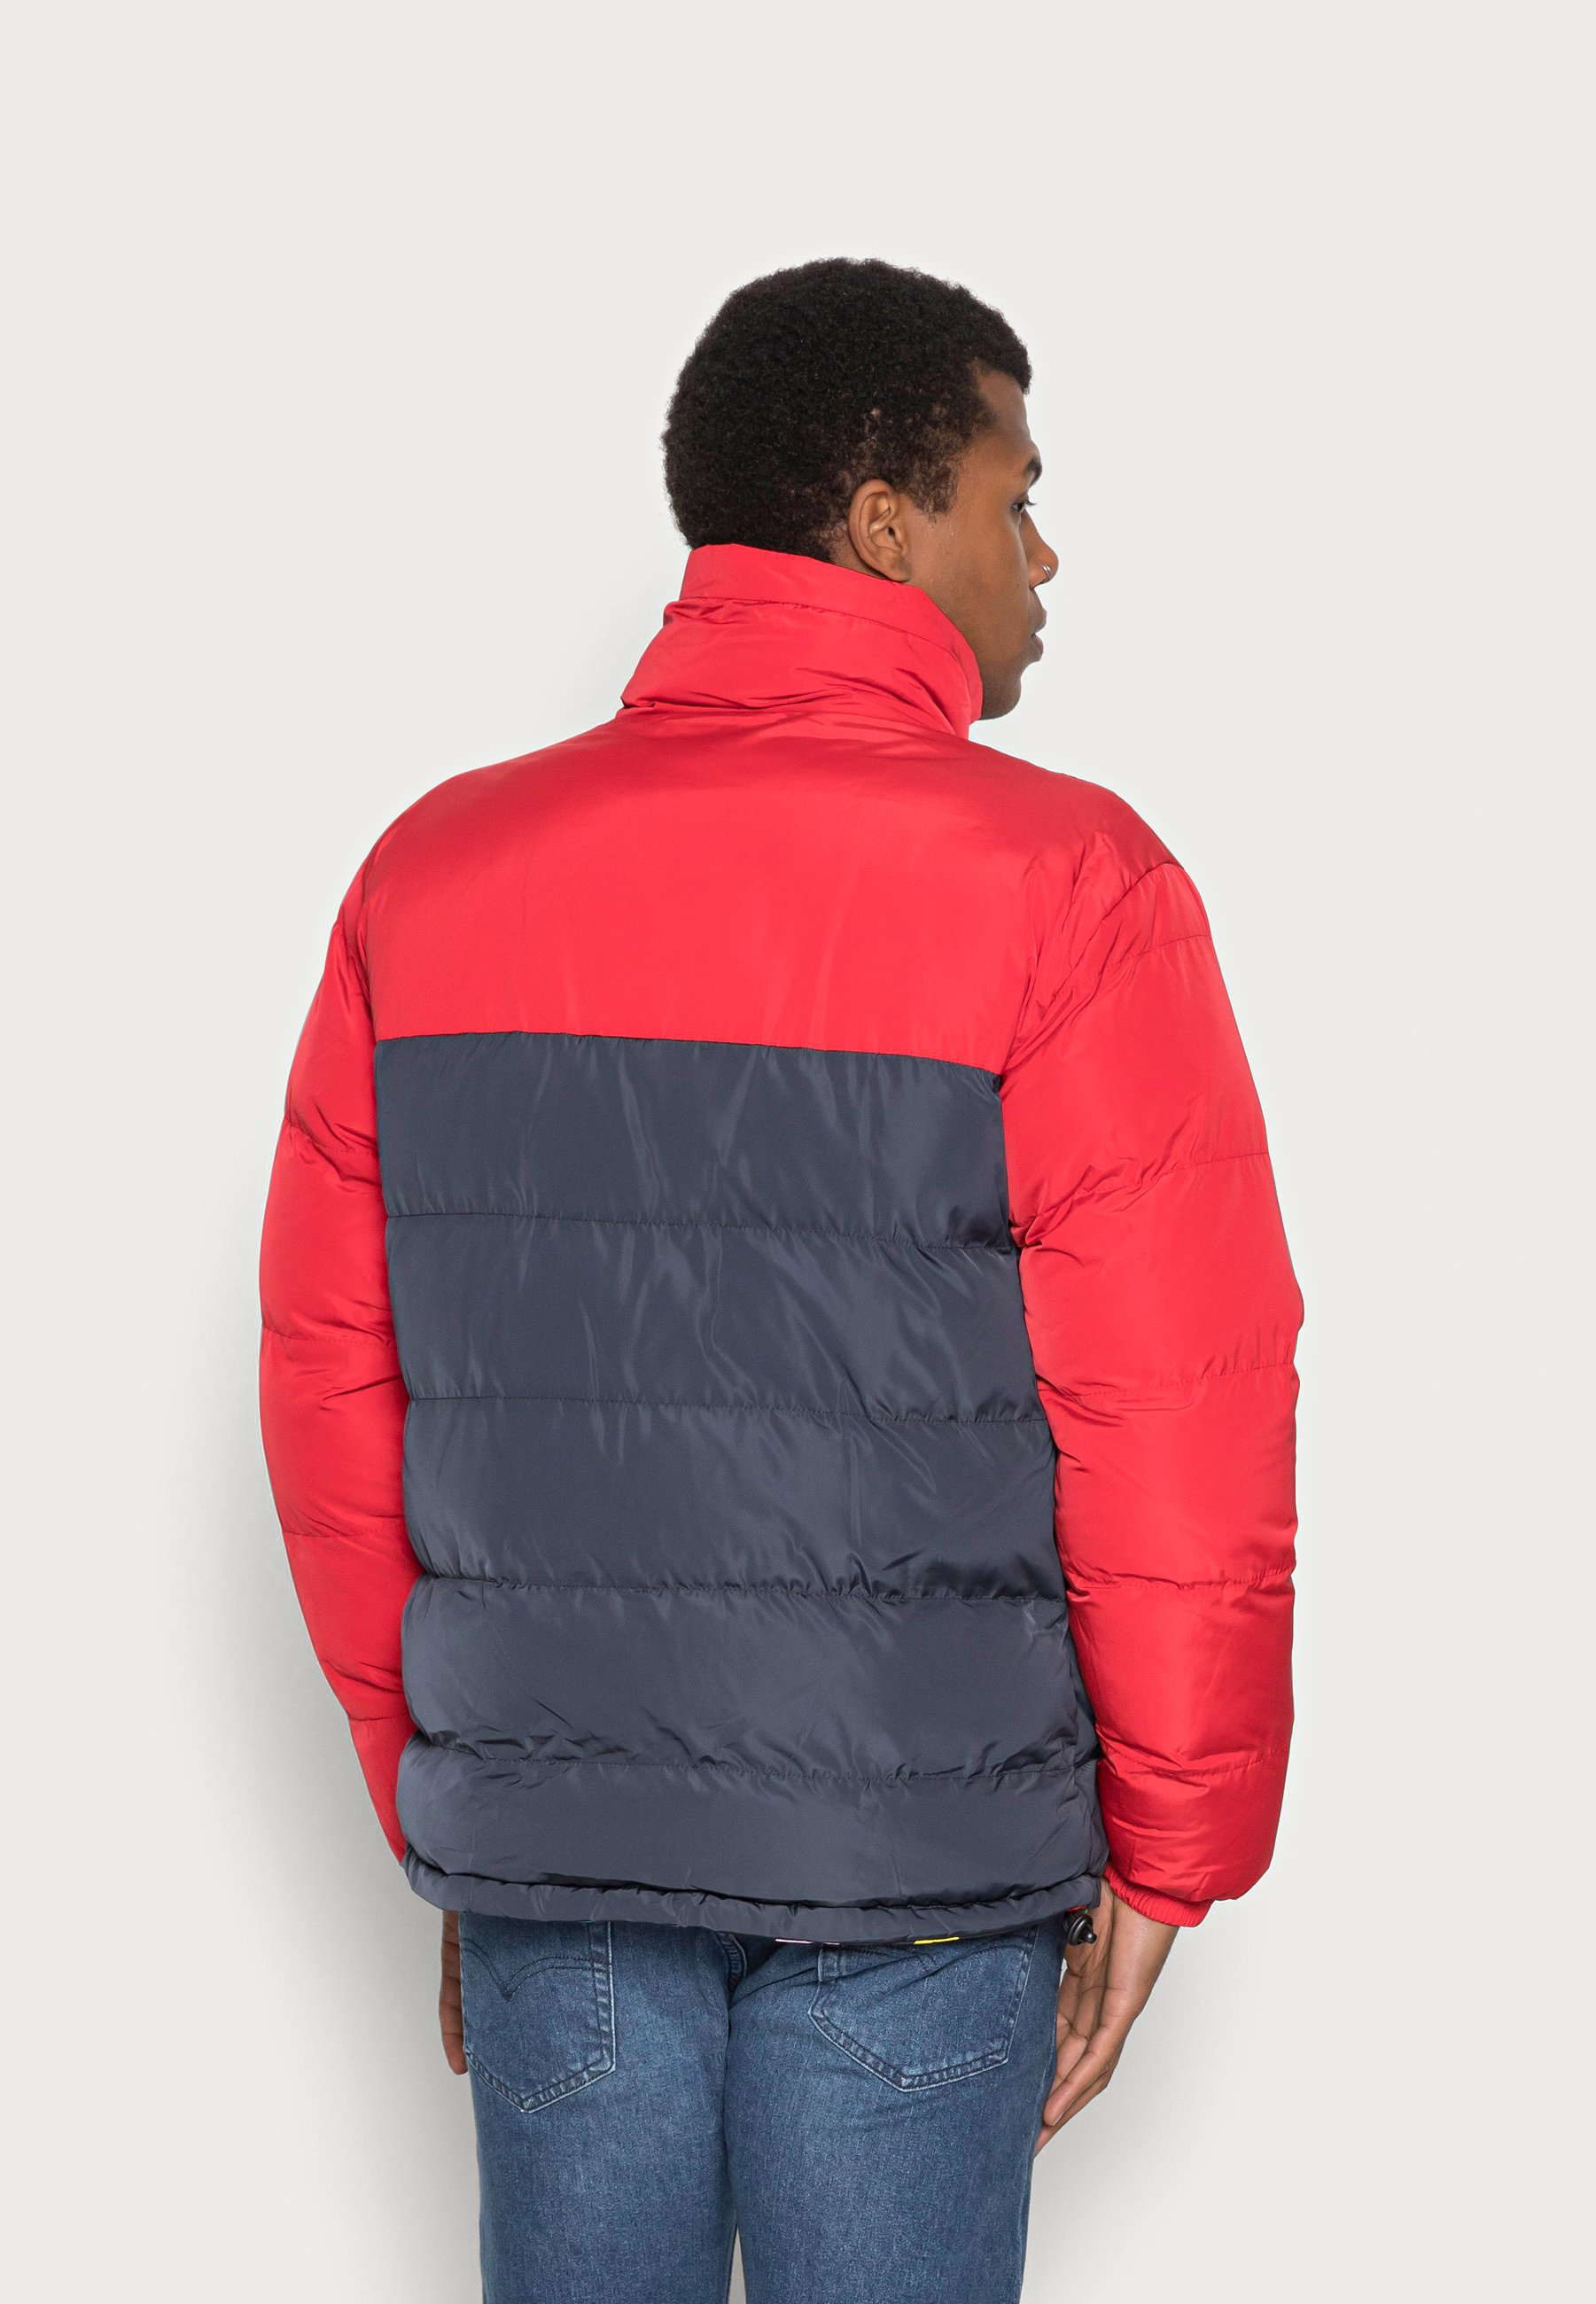 Women UNISEX RETRO REVERSIBLE BLOCK PUFFER JACKET RED - Winter jacket